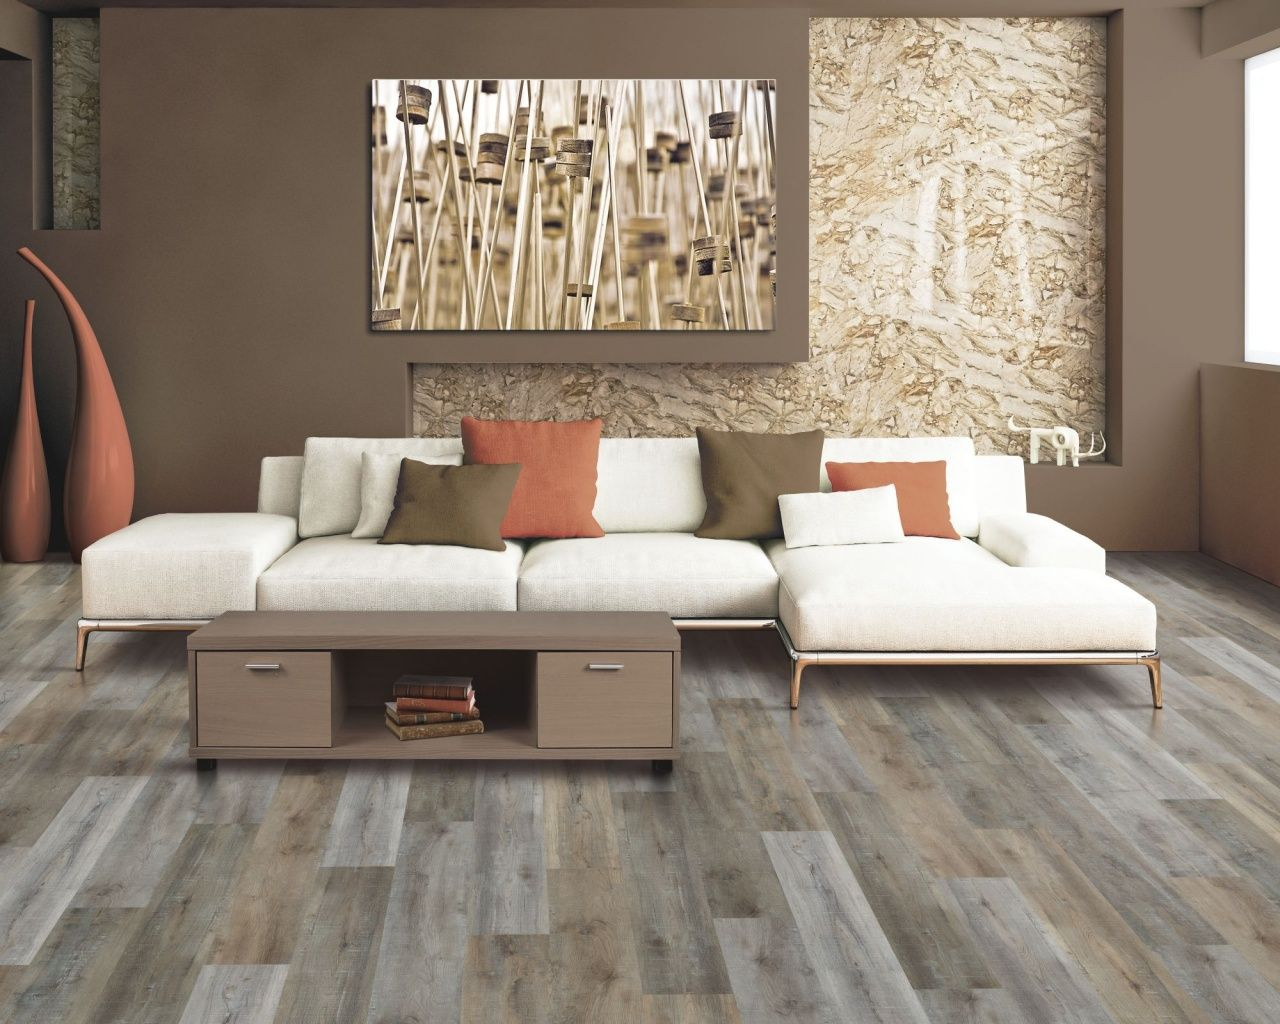 Lifeproof Luxury Vinyl Plank Flooring in 2020 Luxury